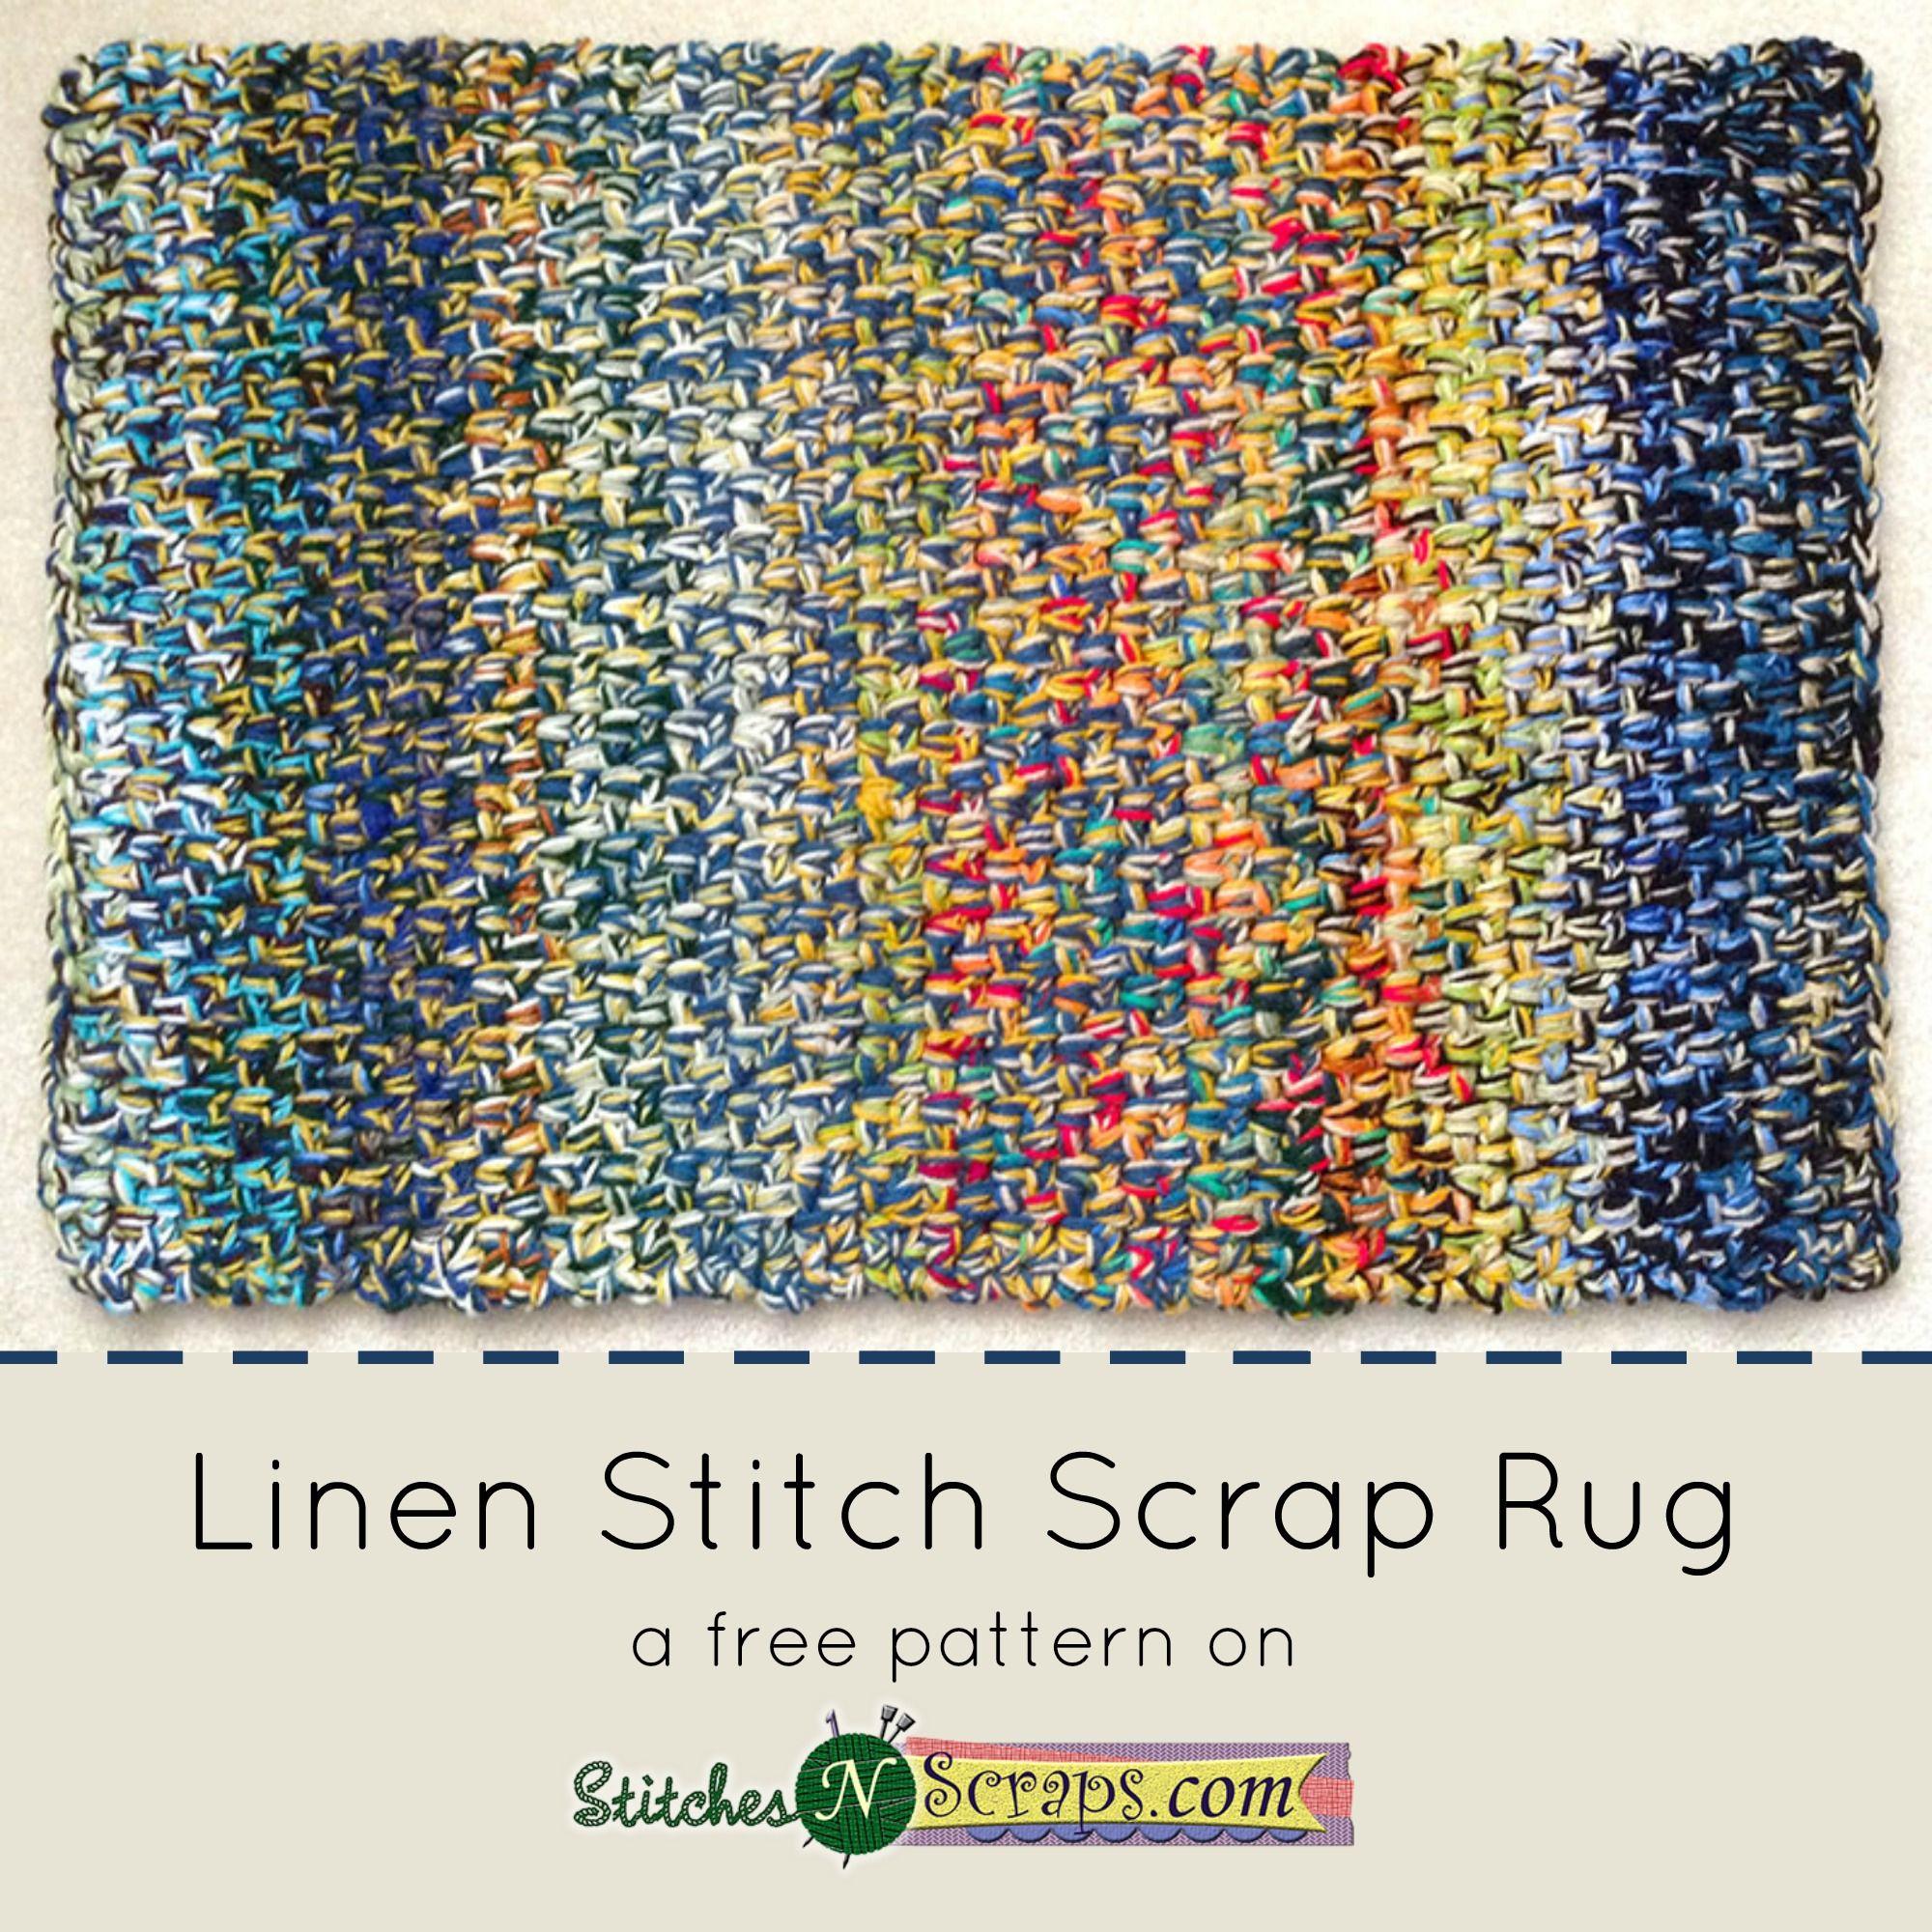 Free Pattern - Linen Stitch Scrap Rug | Crochet Crazy | Pinterest ...